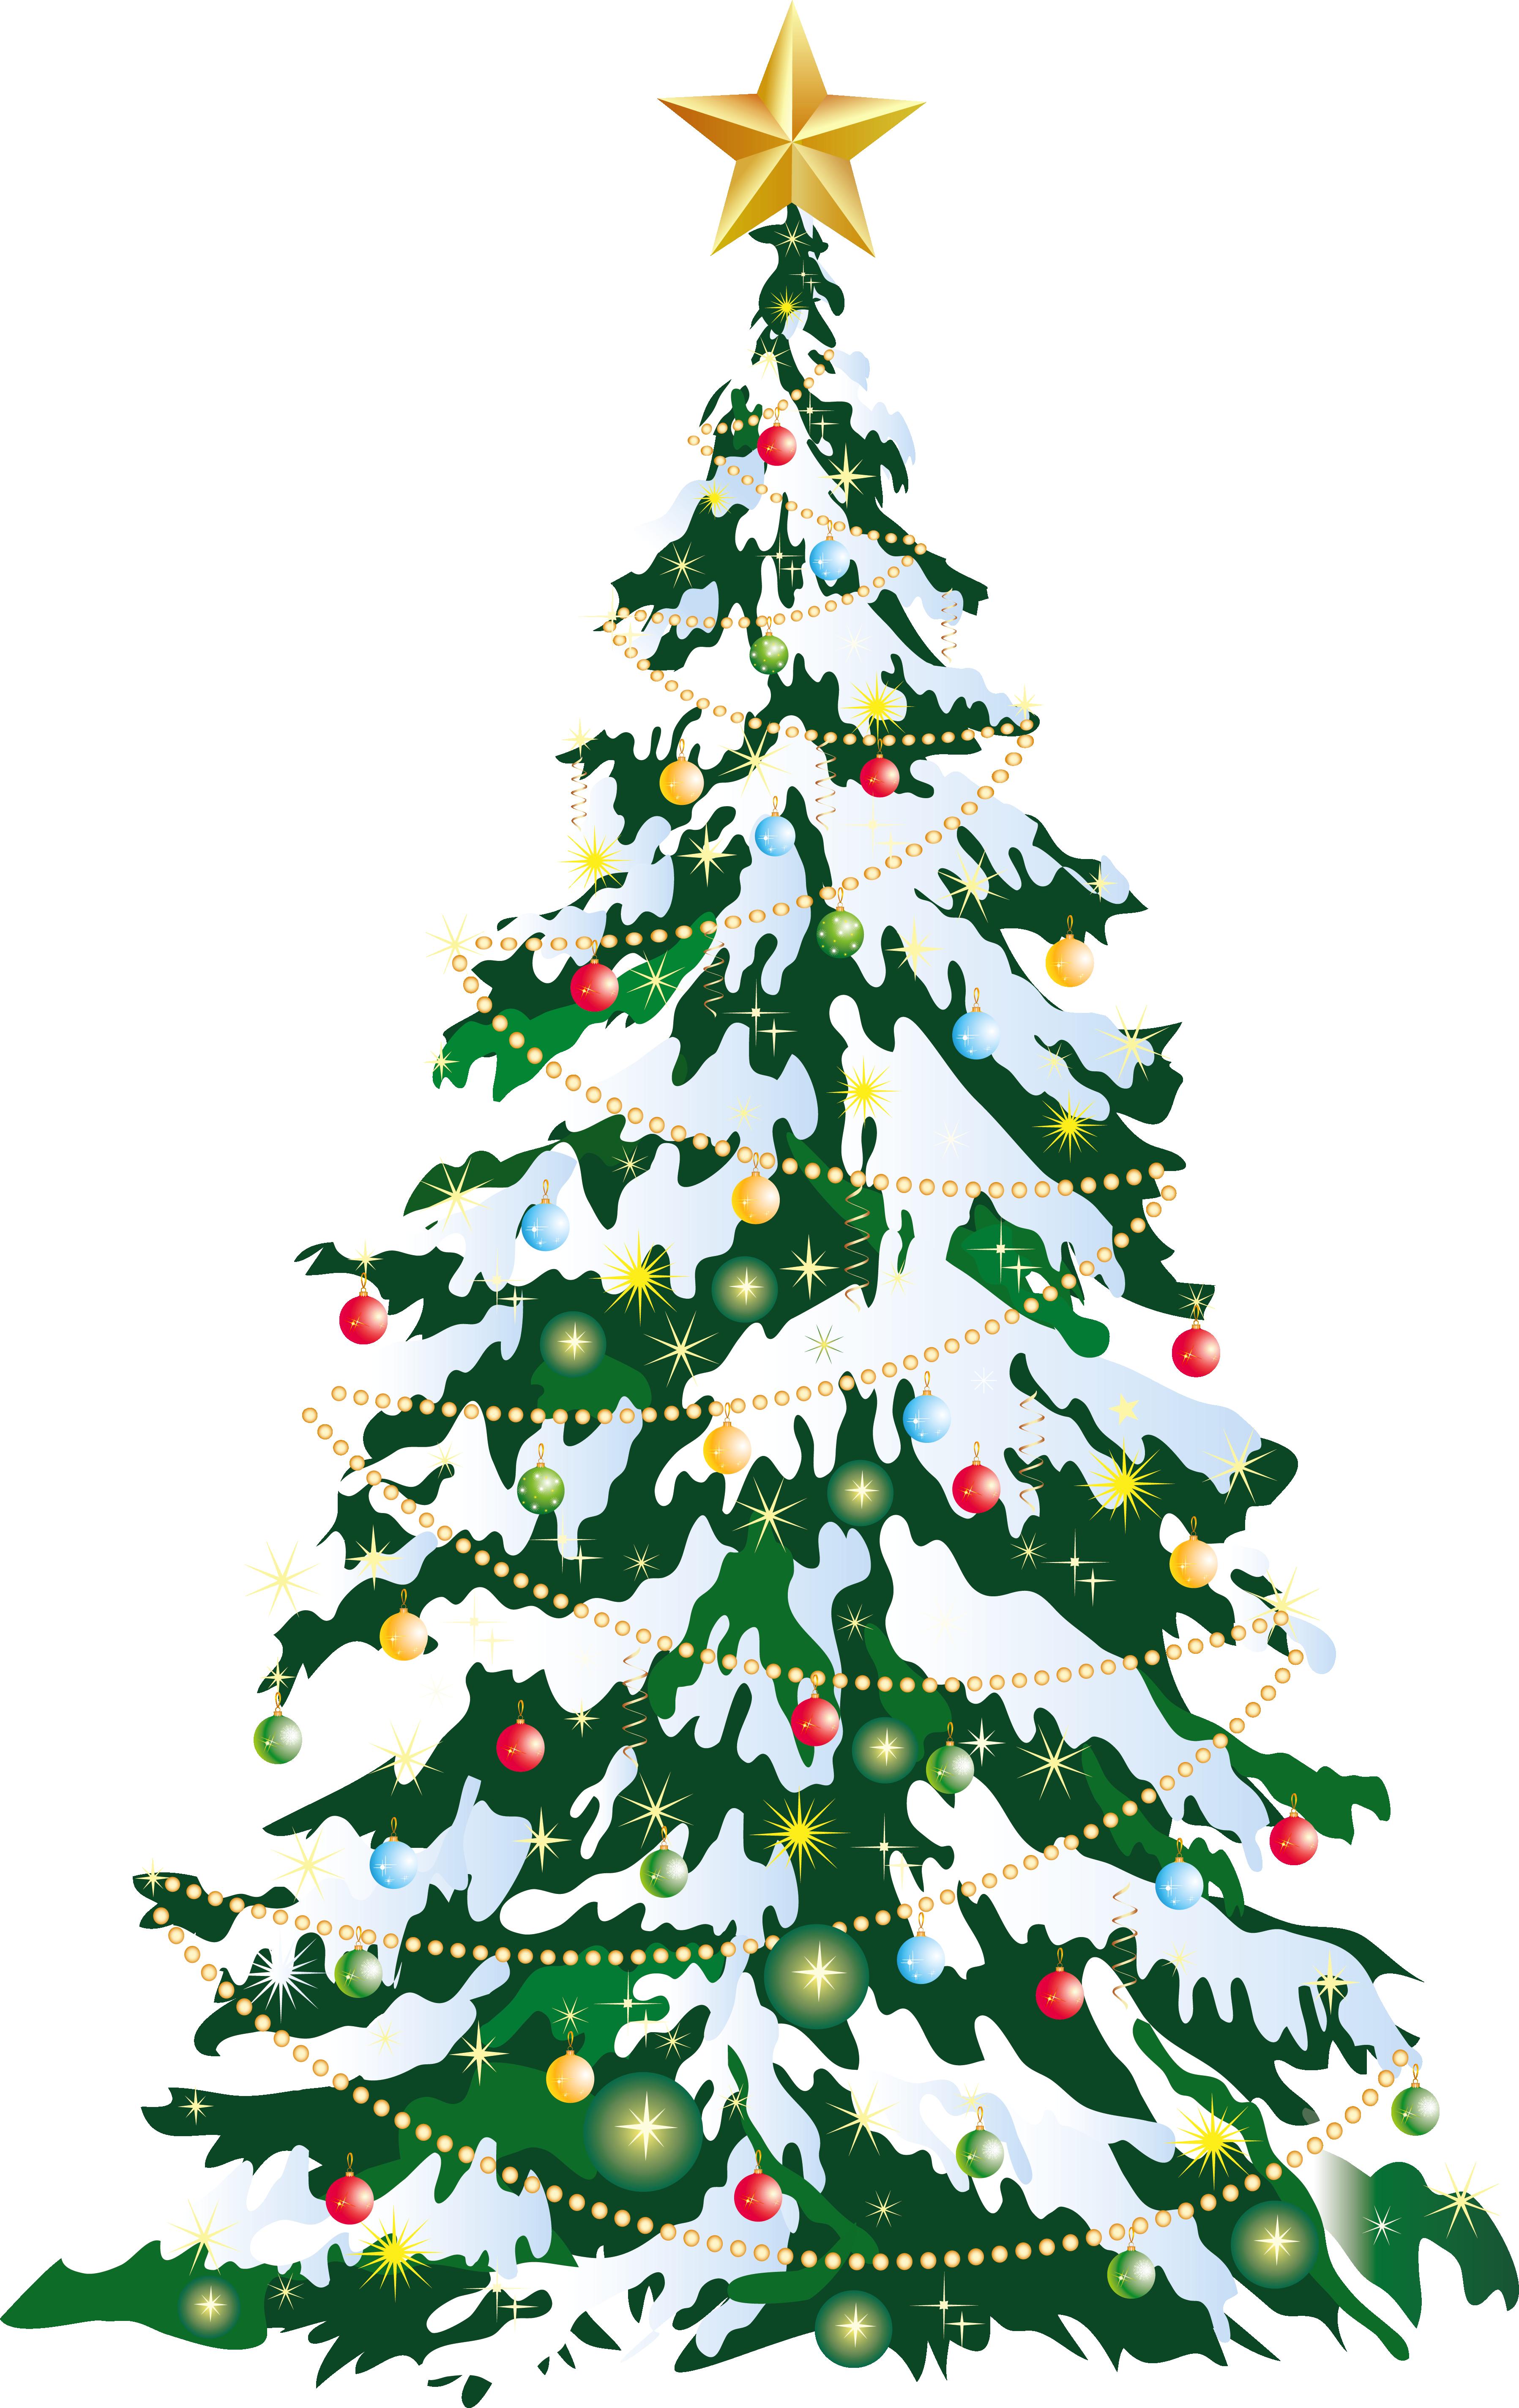 Clipart beach christmas tree, Picture #397655 clipart beach.